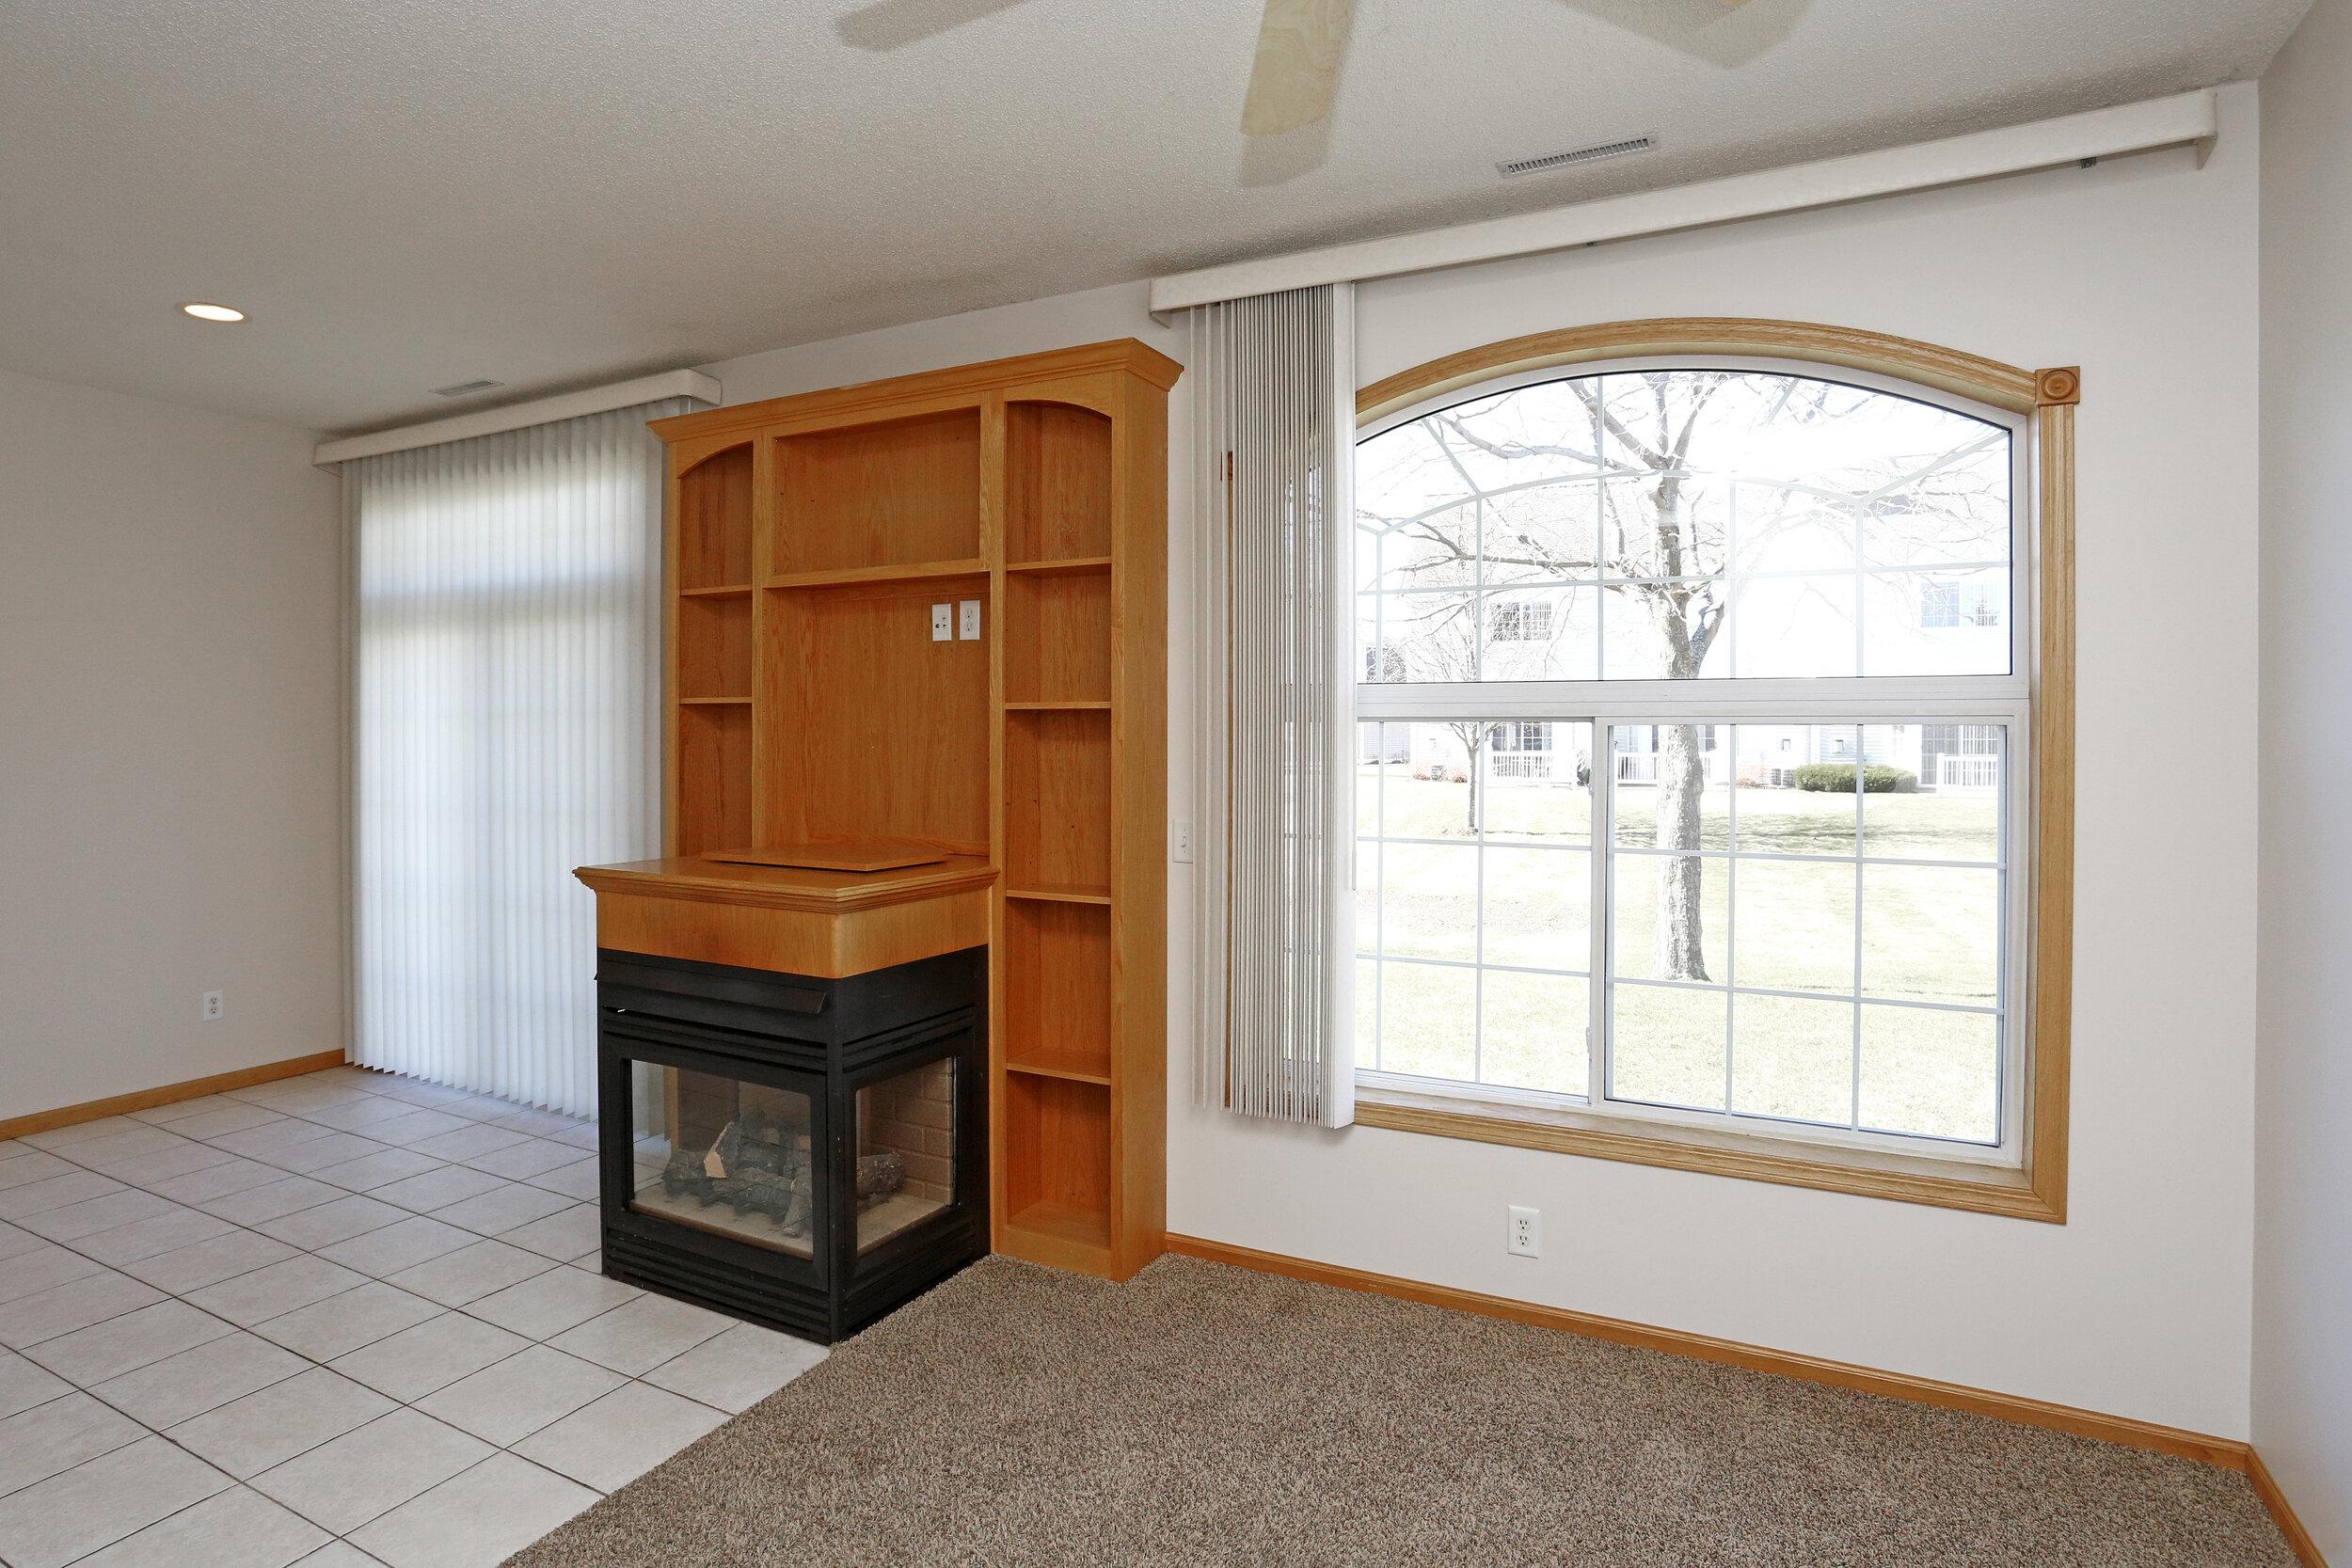 Oversized Windows Provides Natural Light Filling the Living Area